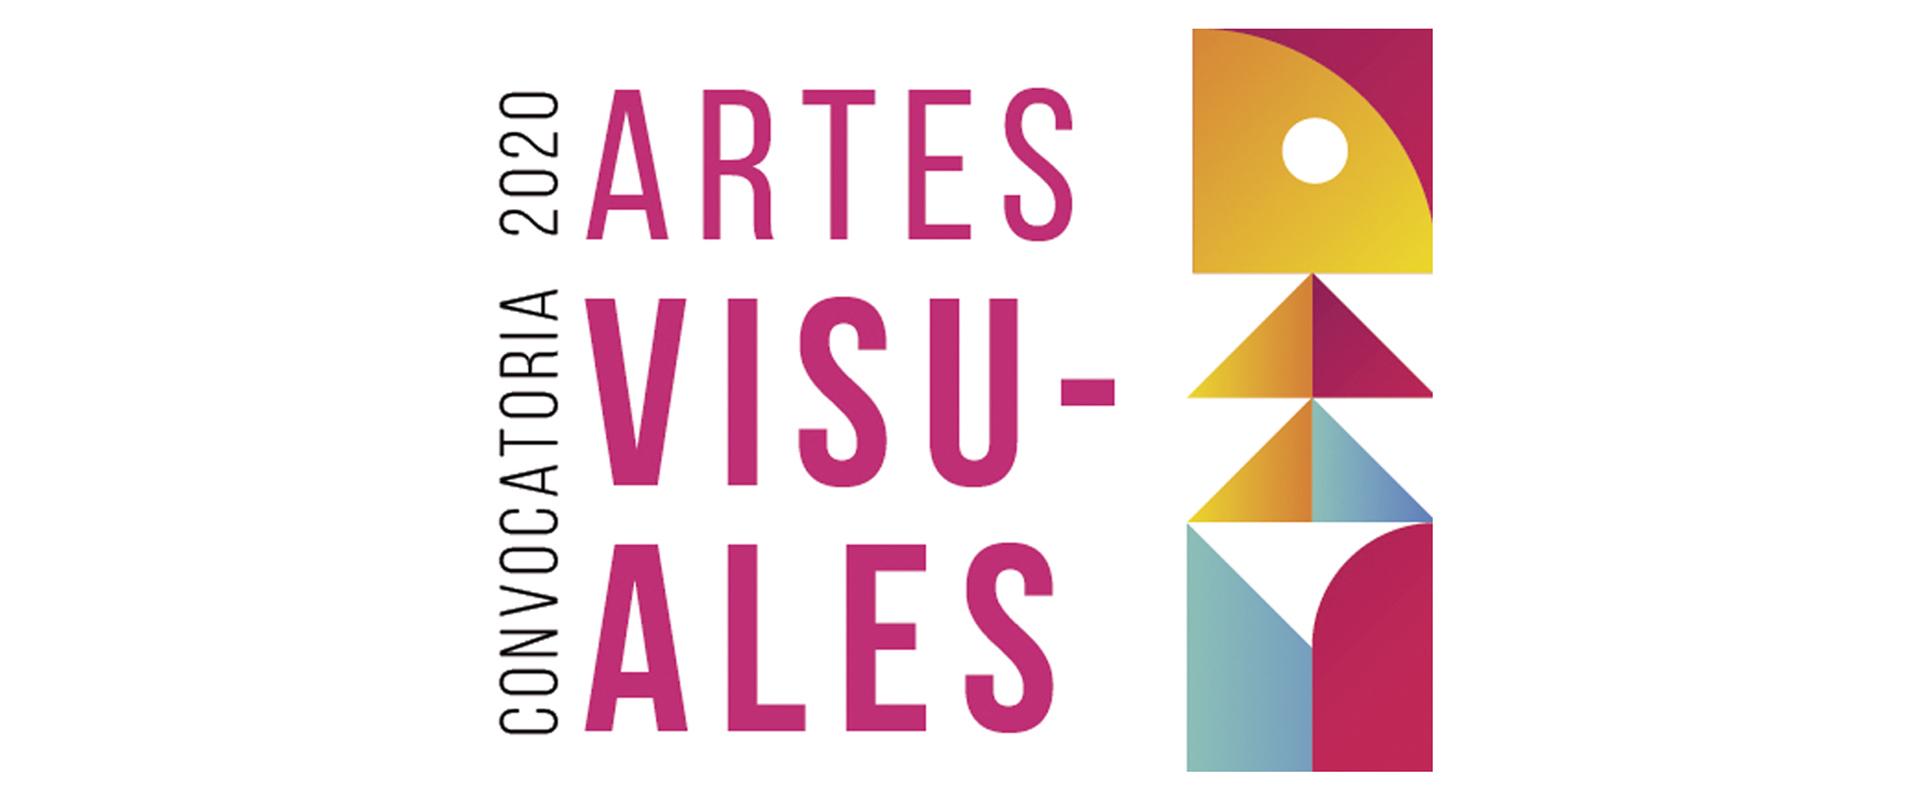 Convocatoria Arte Visuales 2020